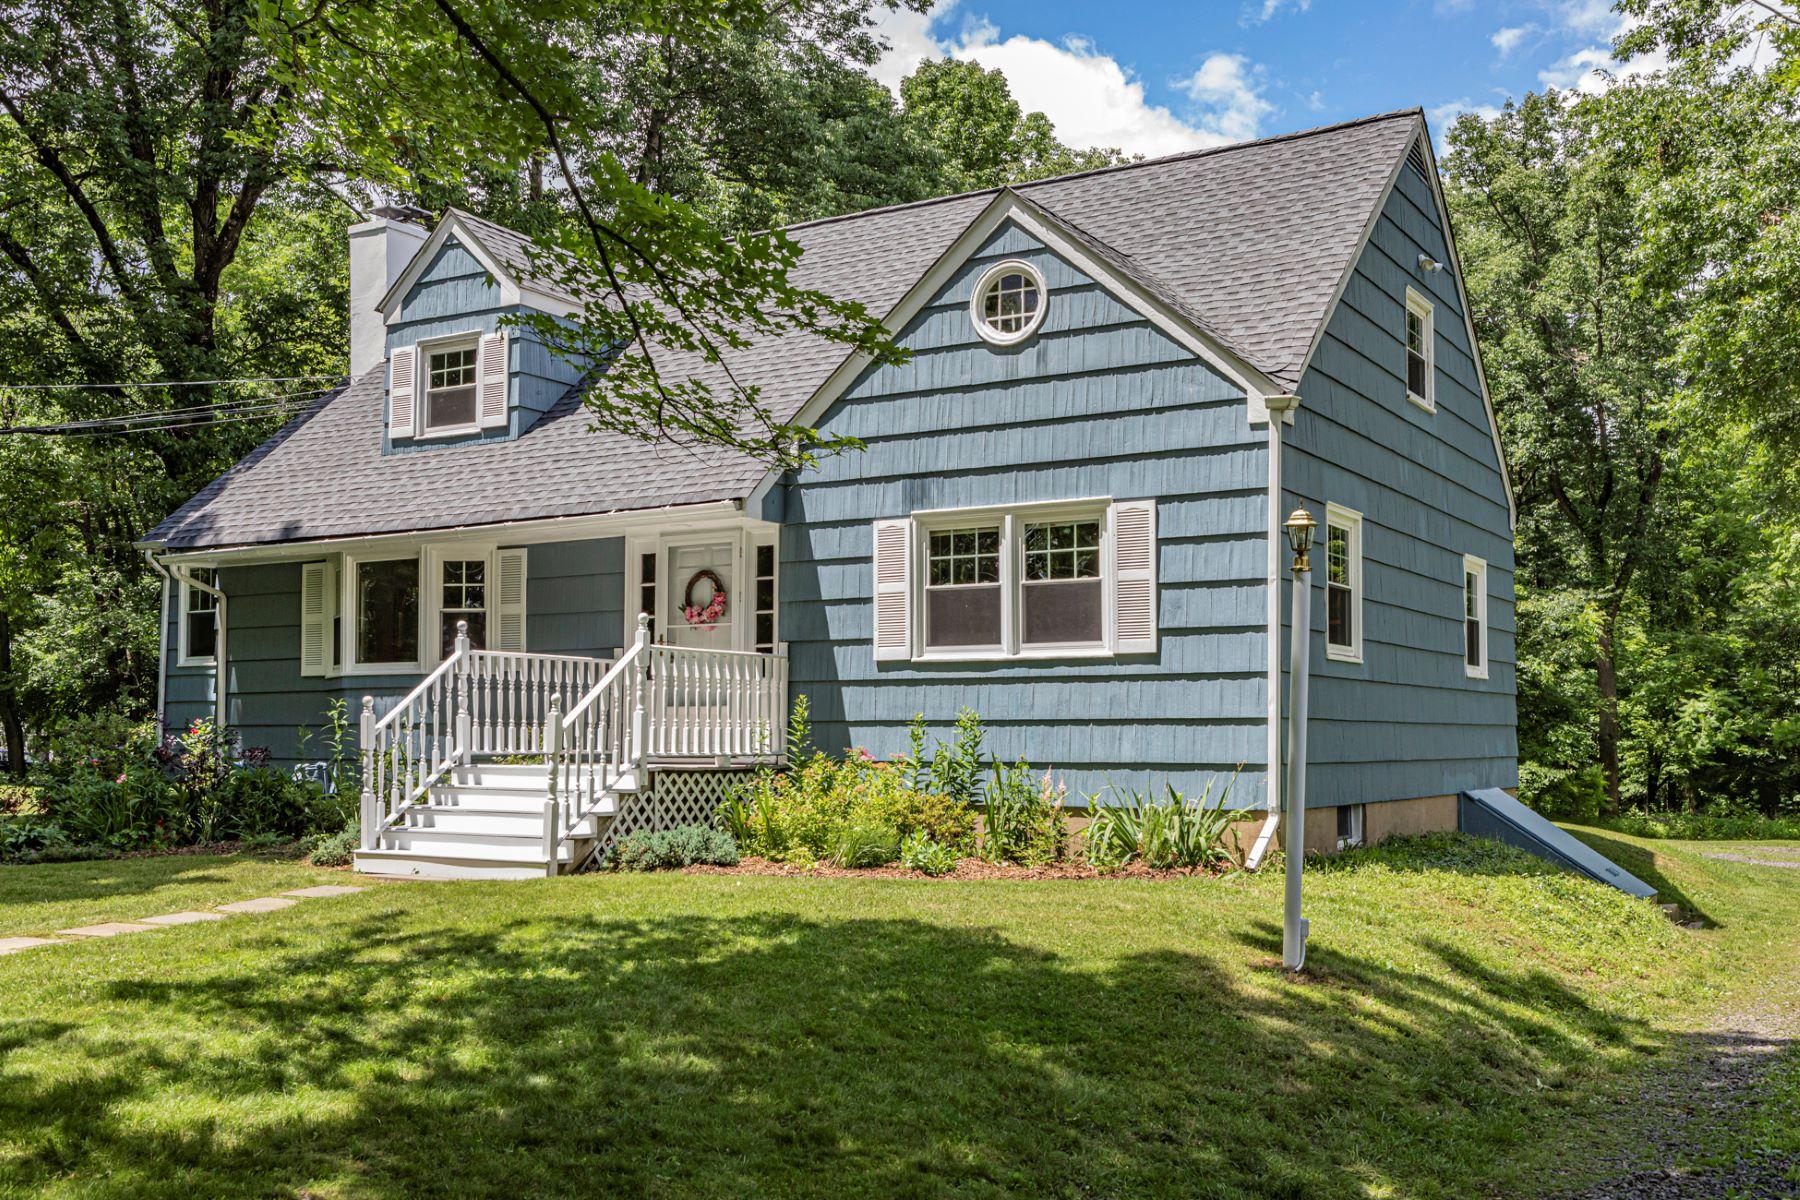 Single Family Homes のために 売買 アット Spacious With Many Recent Improvements 460 Route 518, Skillman, ニュージャージー 08558 アメリカ